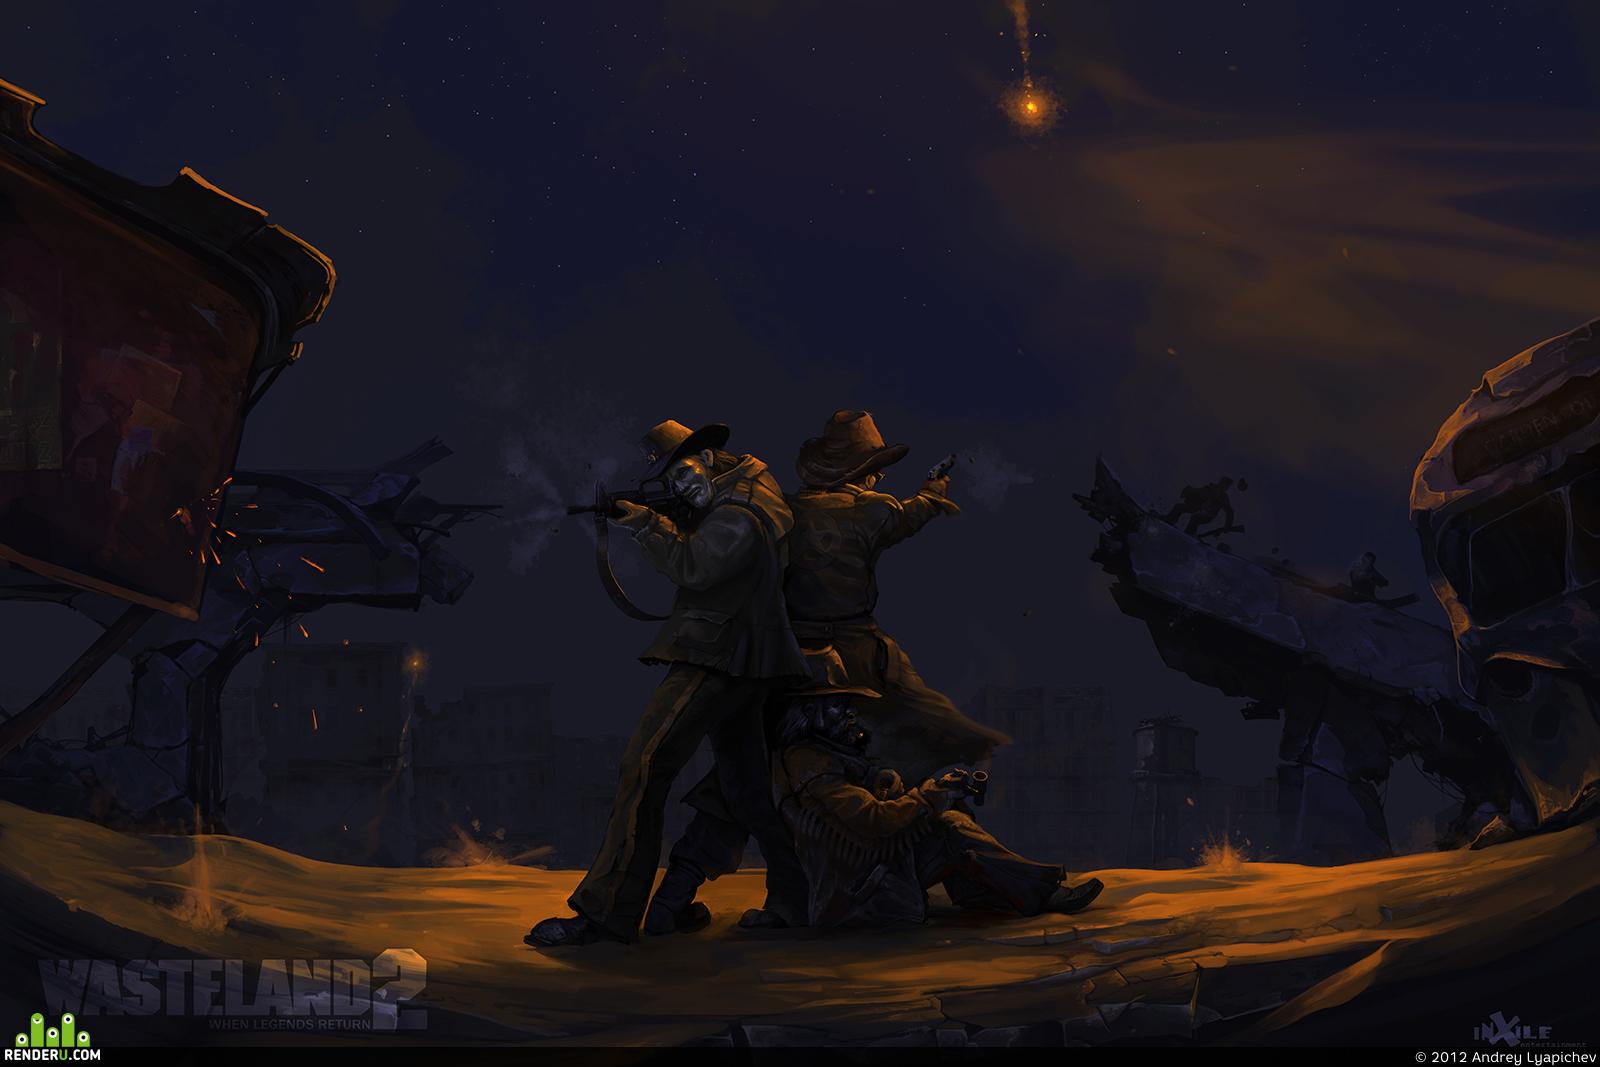 preview Засада - плакат для игры Wasteland 2